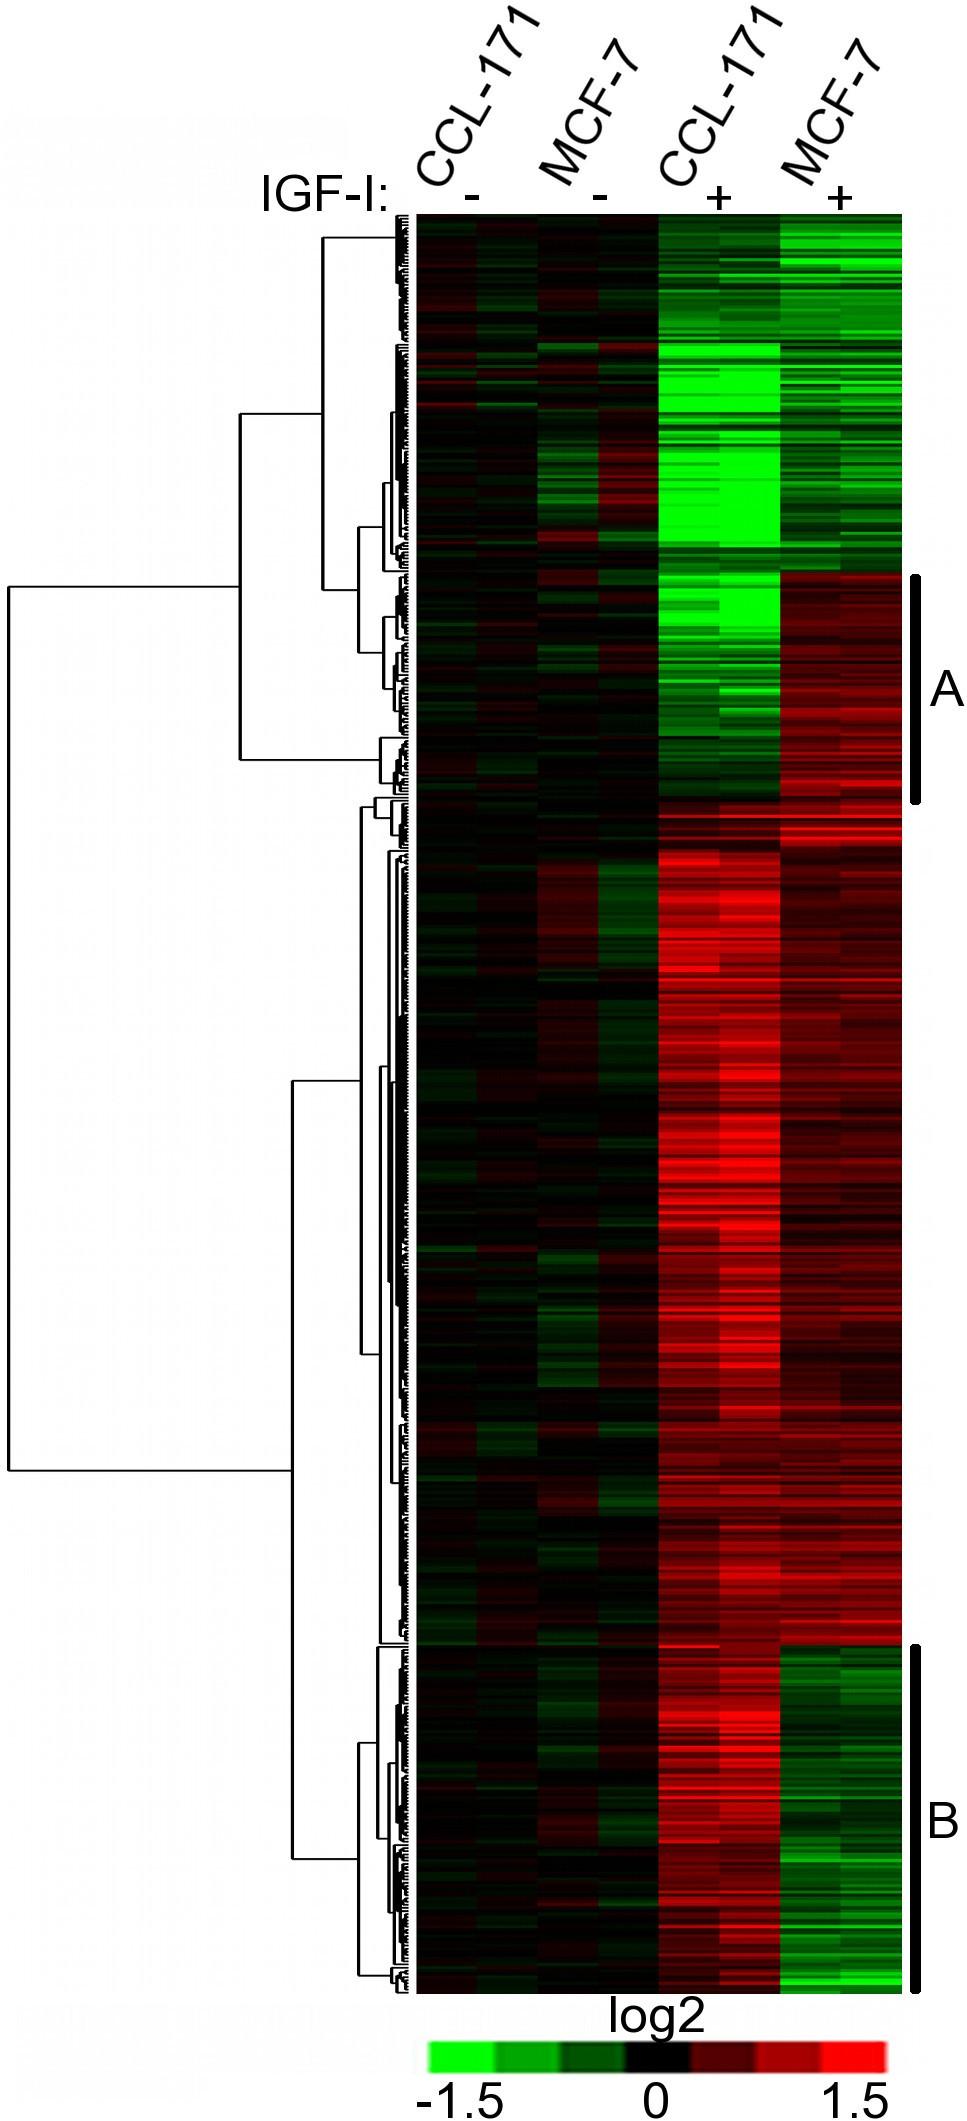 IGF-I induced genes in stromal fibroblasts predict the clinical